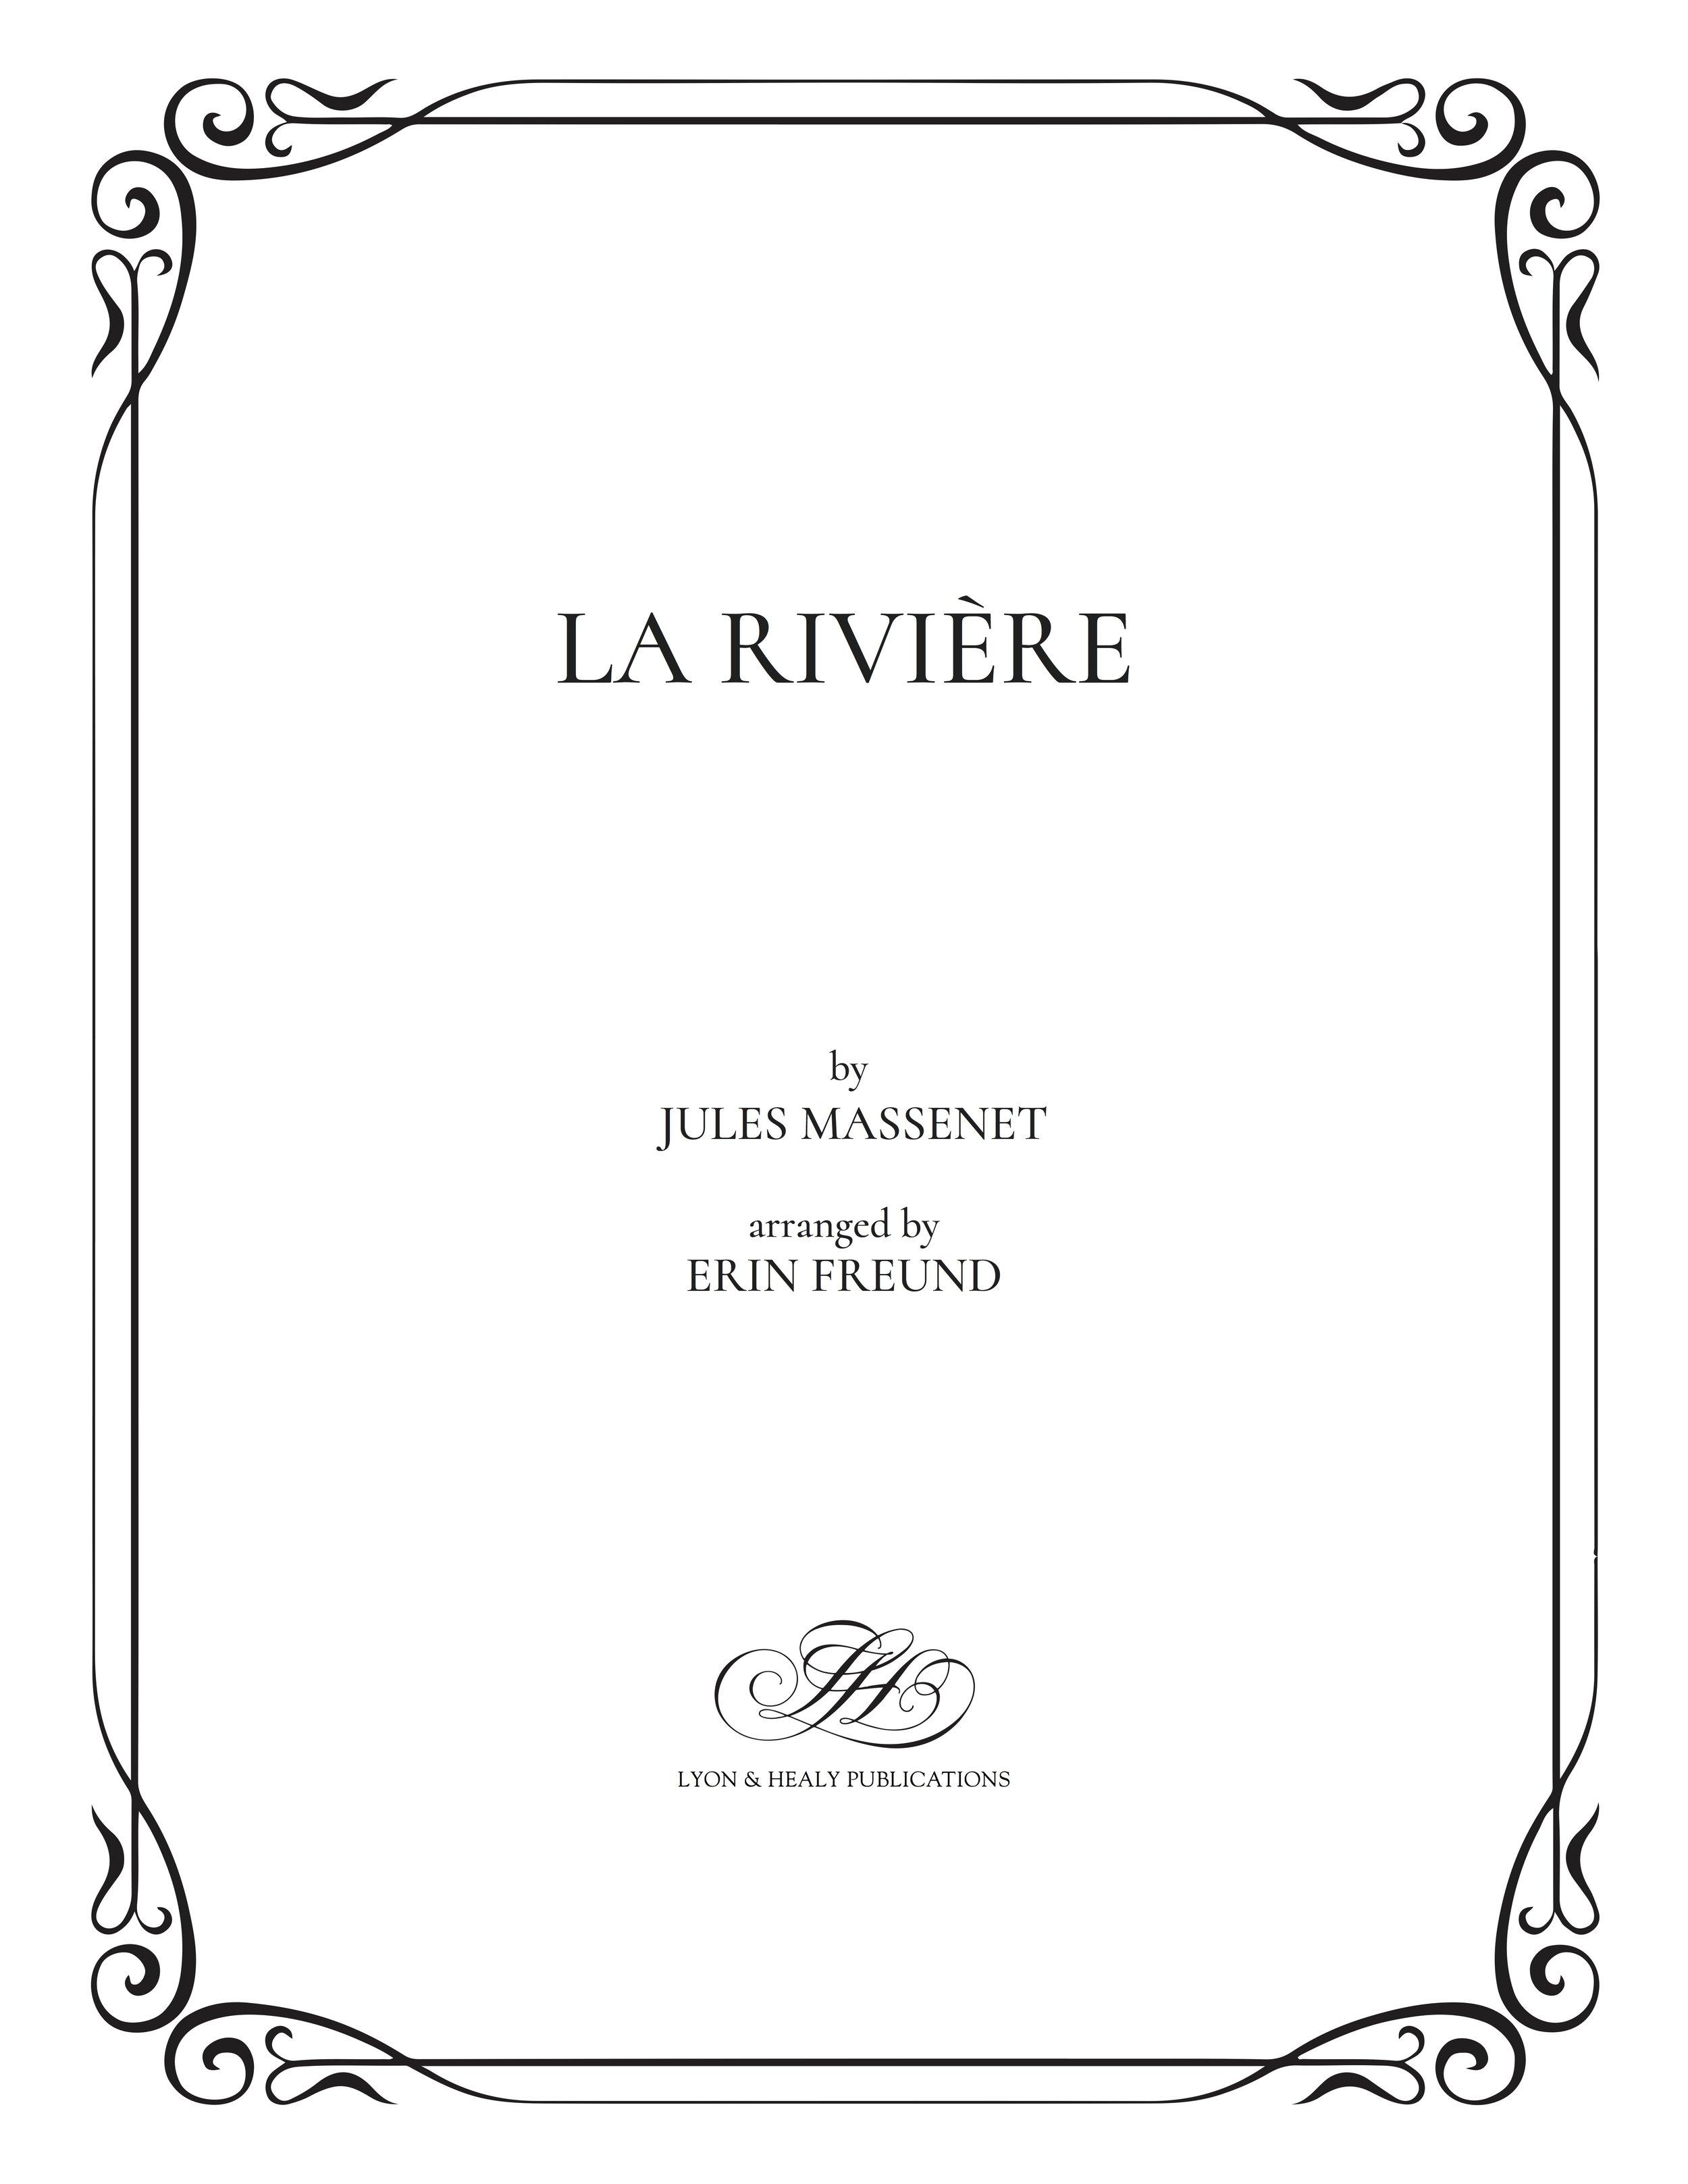 La rivière - Massenet-Freund cover.jpg